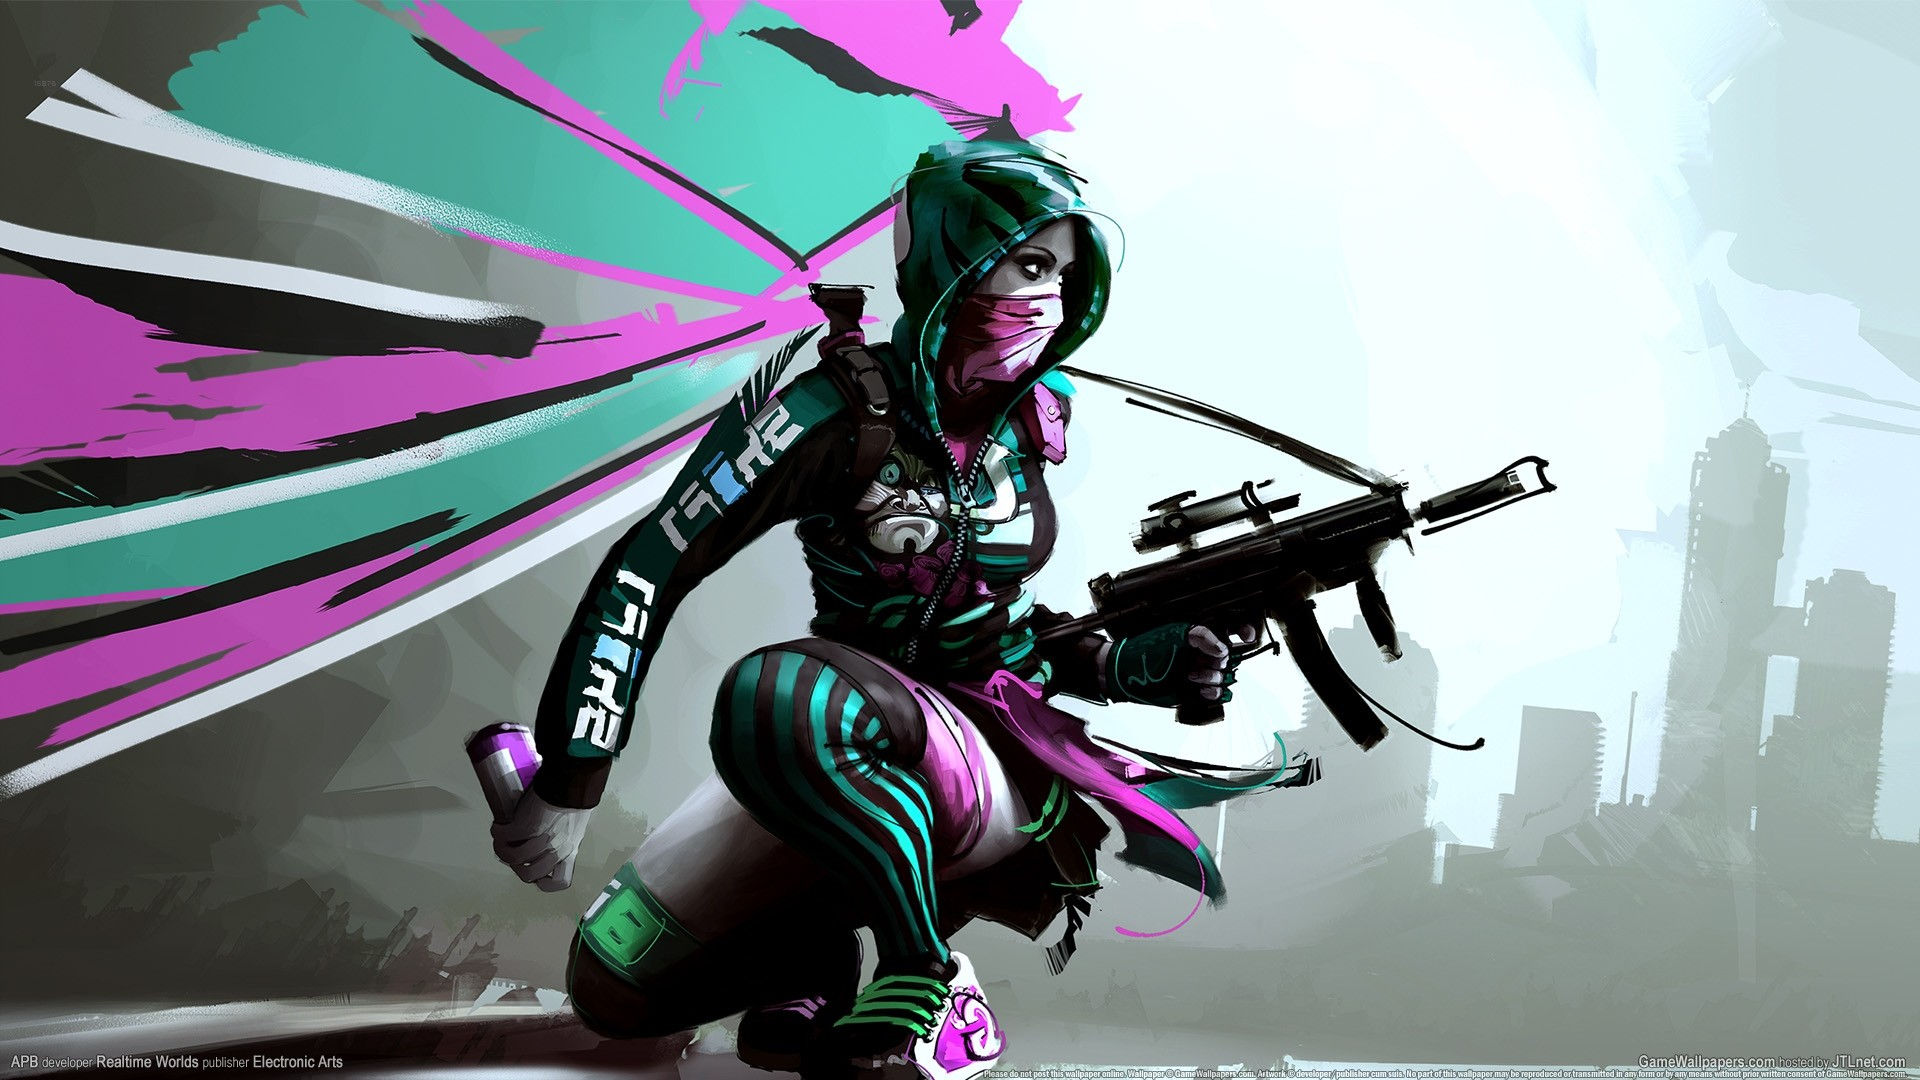 Paint Assassin Wallpapers, Spray Paint Assassin Myspace Backgrounds .